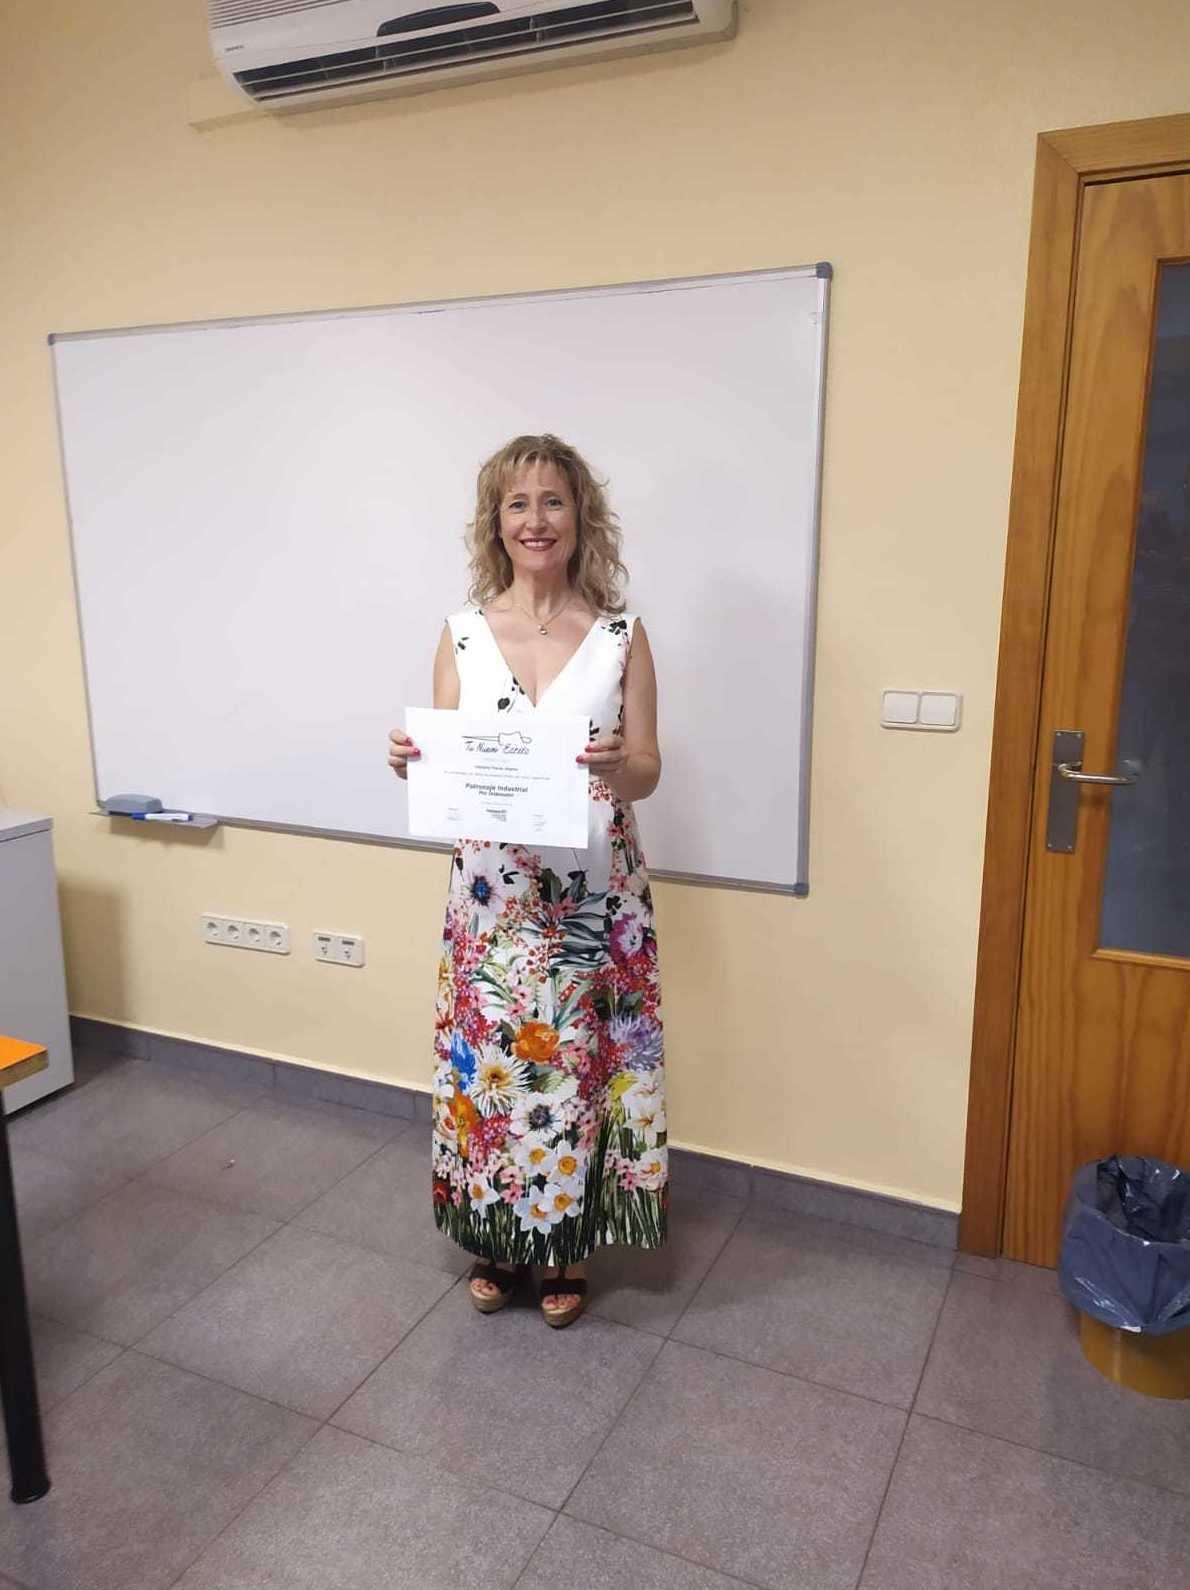 Diploma de patronaje por ordenador